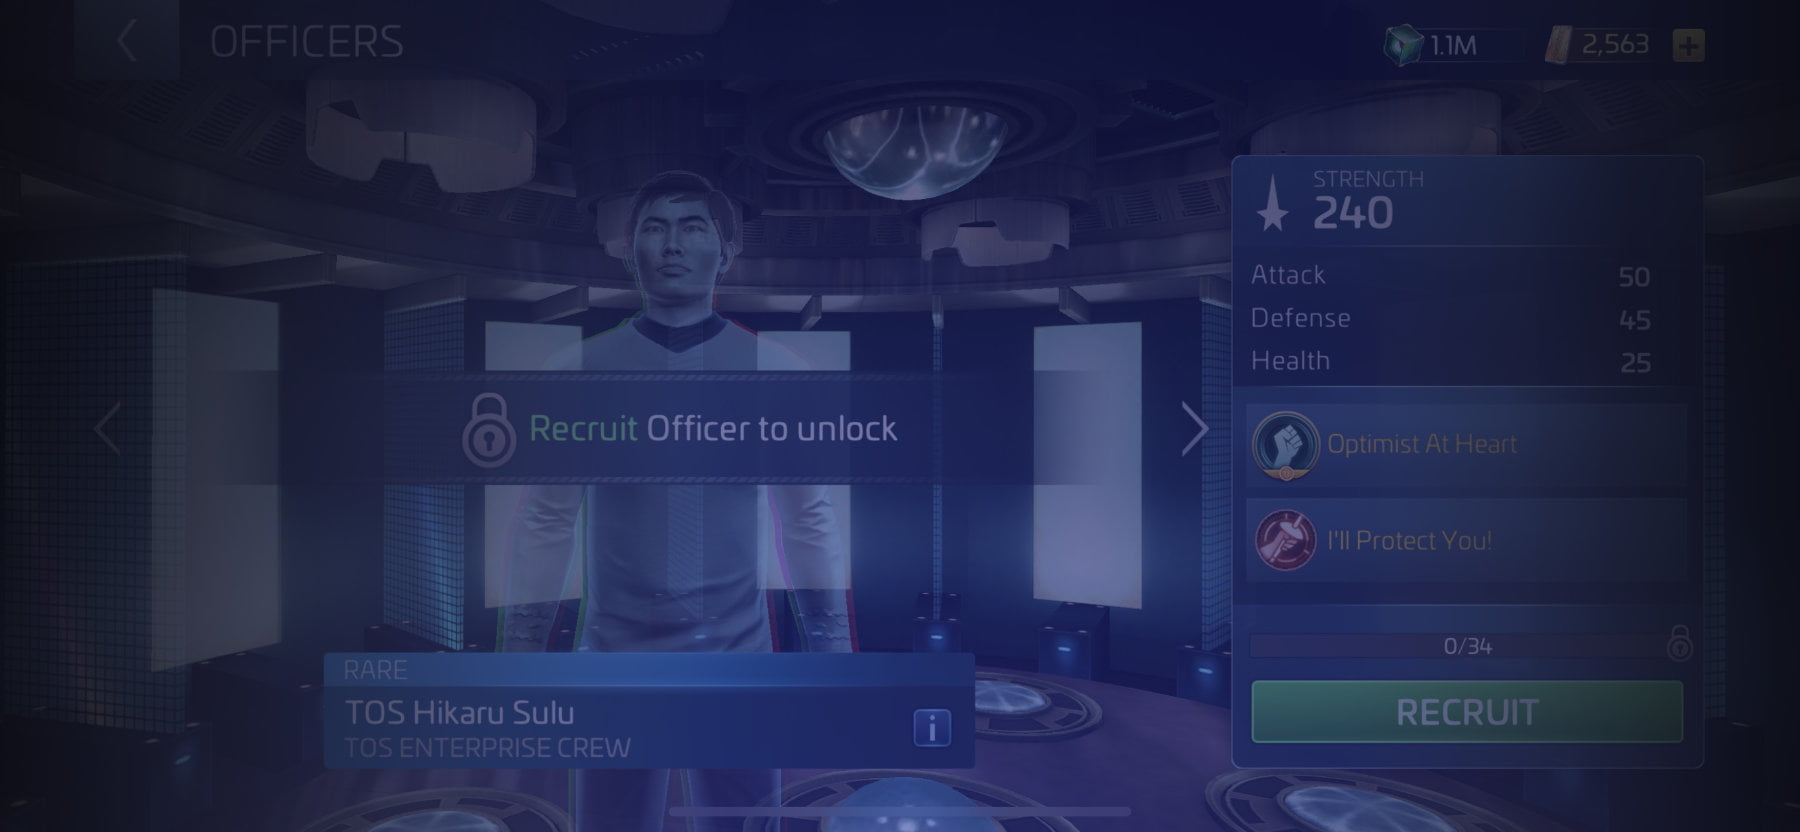 Officer TOS Hikaru Sulu